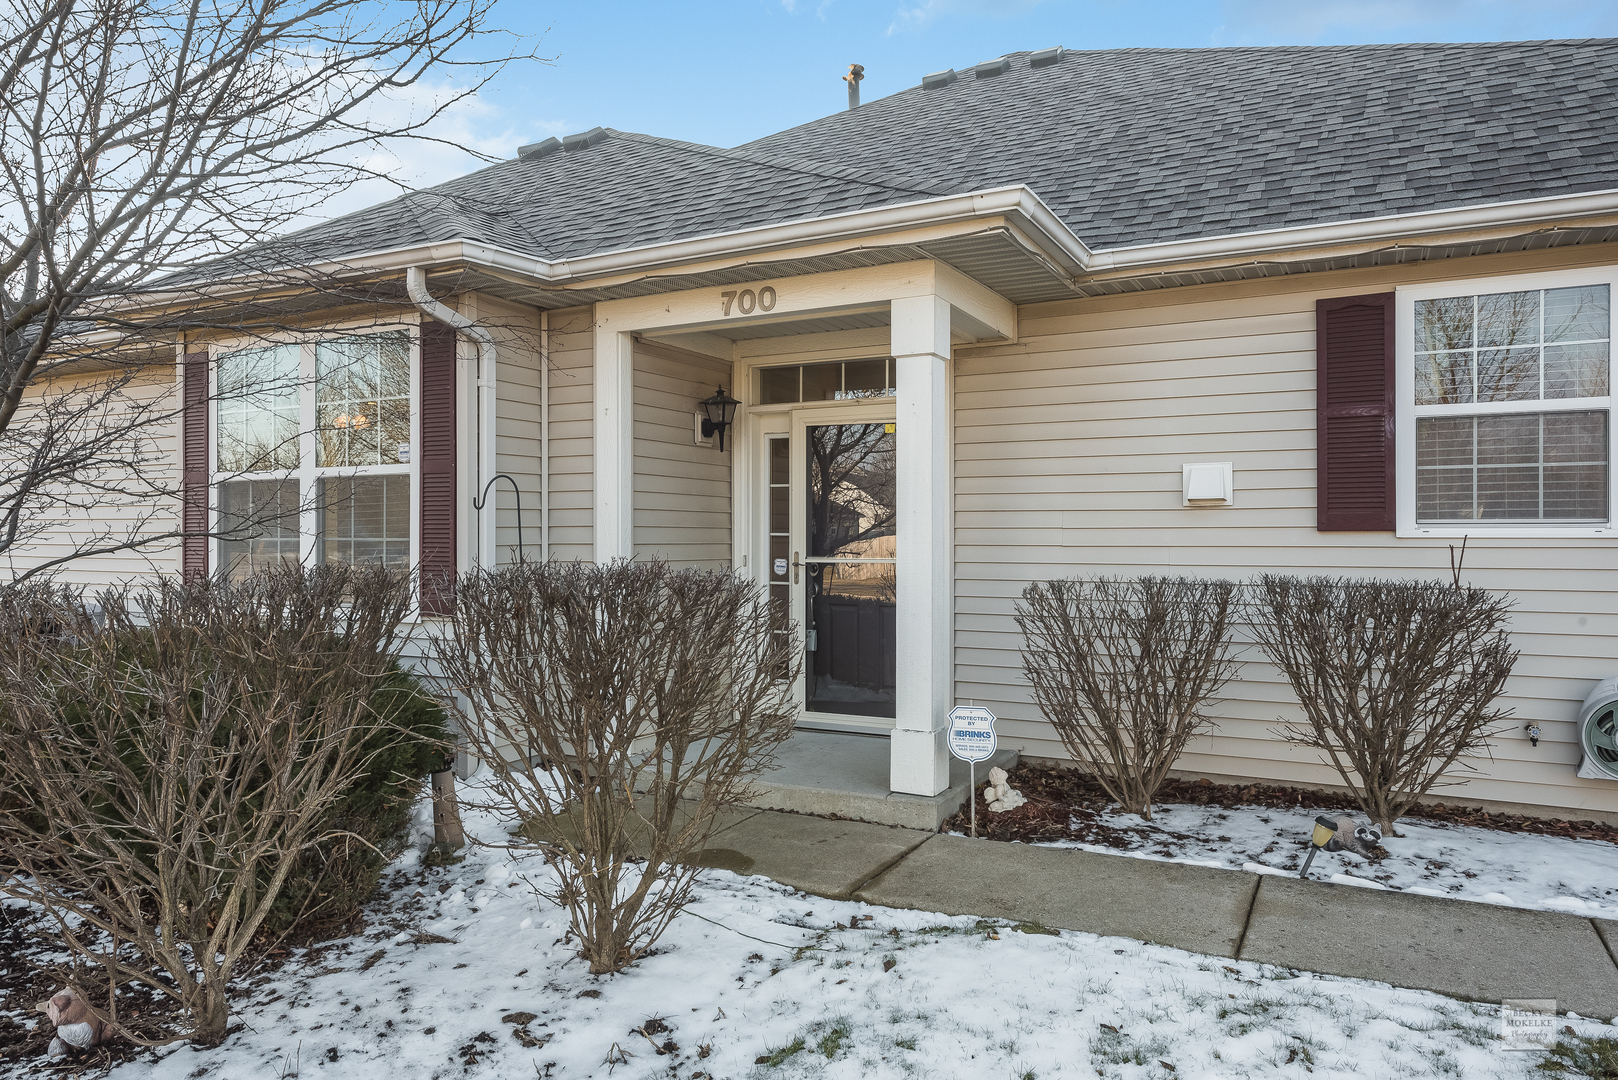 700 Bellevue, Oswego, Illinois, 60543